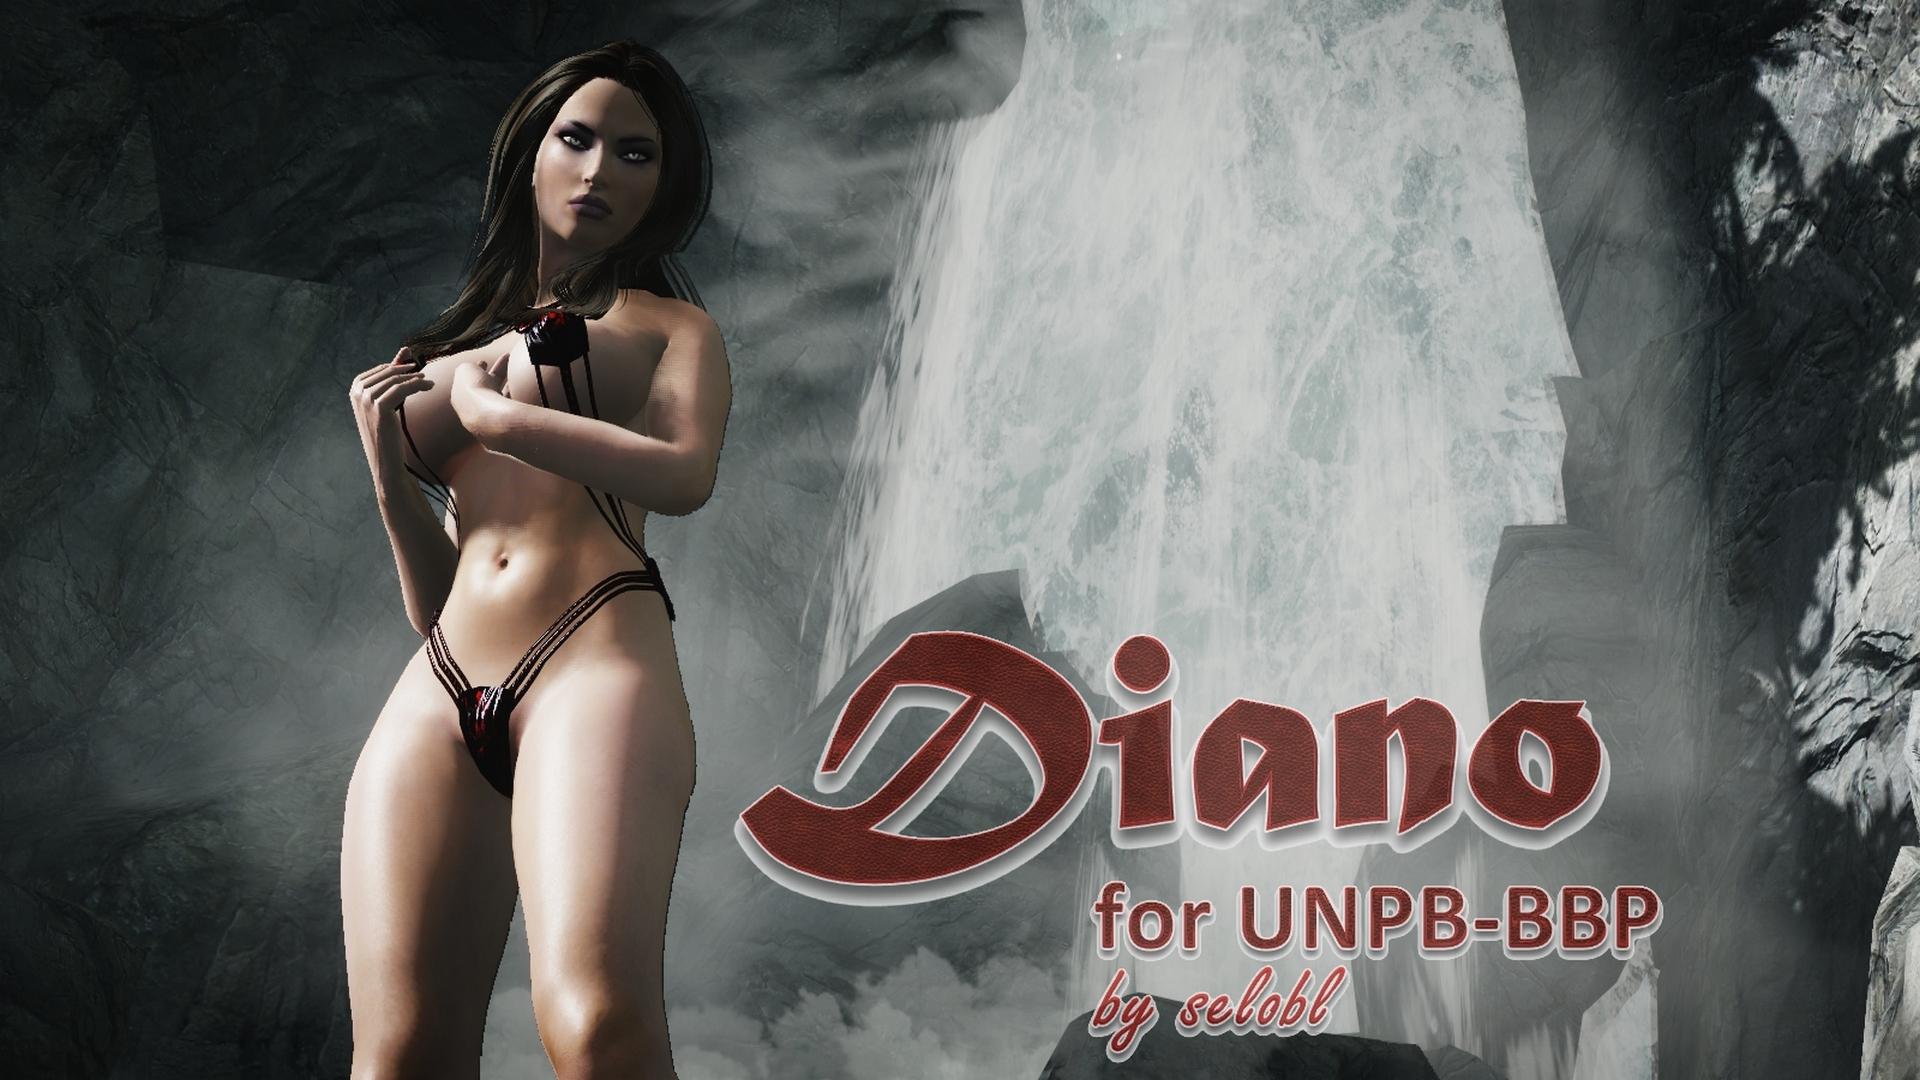 Diano_Bikini_&_Armor_for_UNPB_BBP.jpg